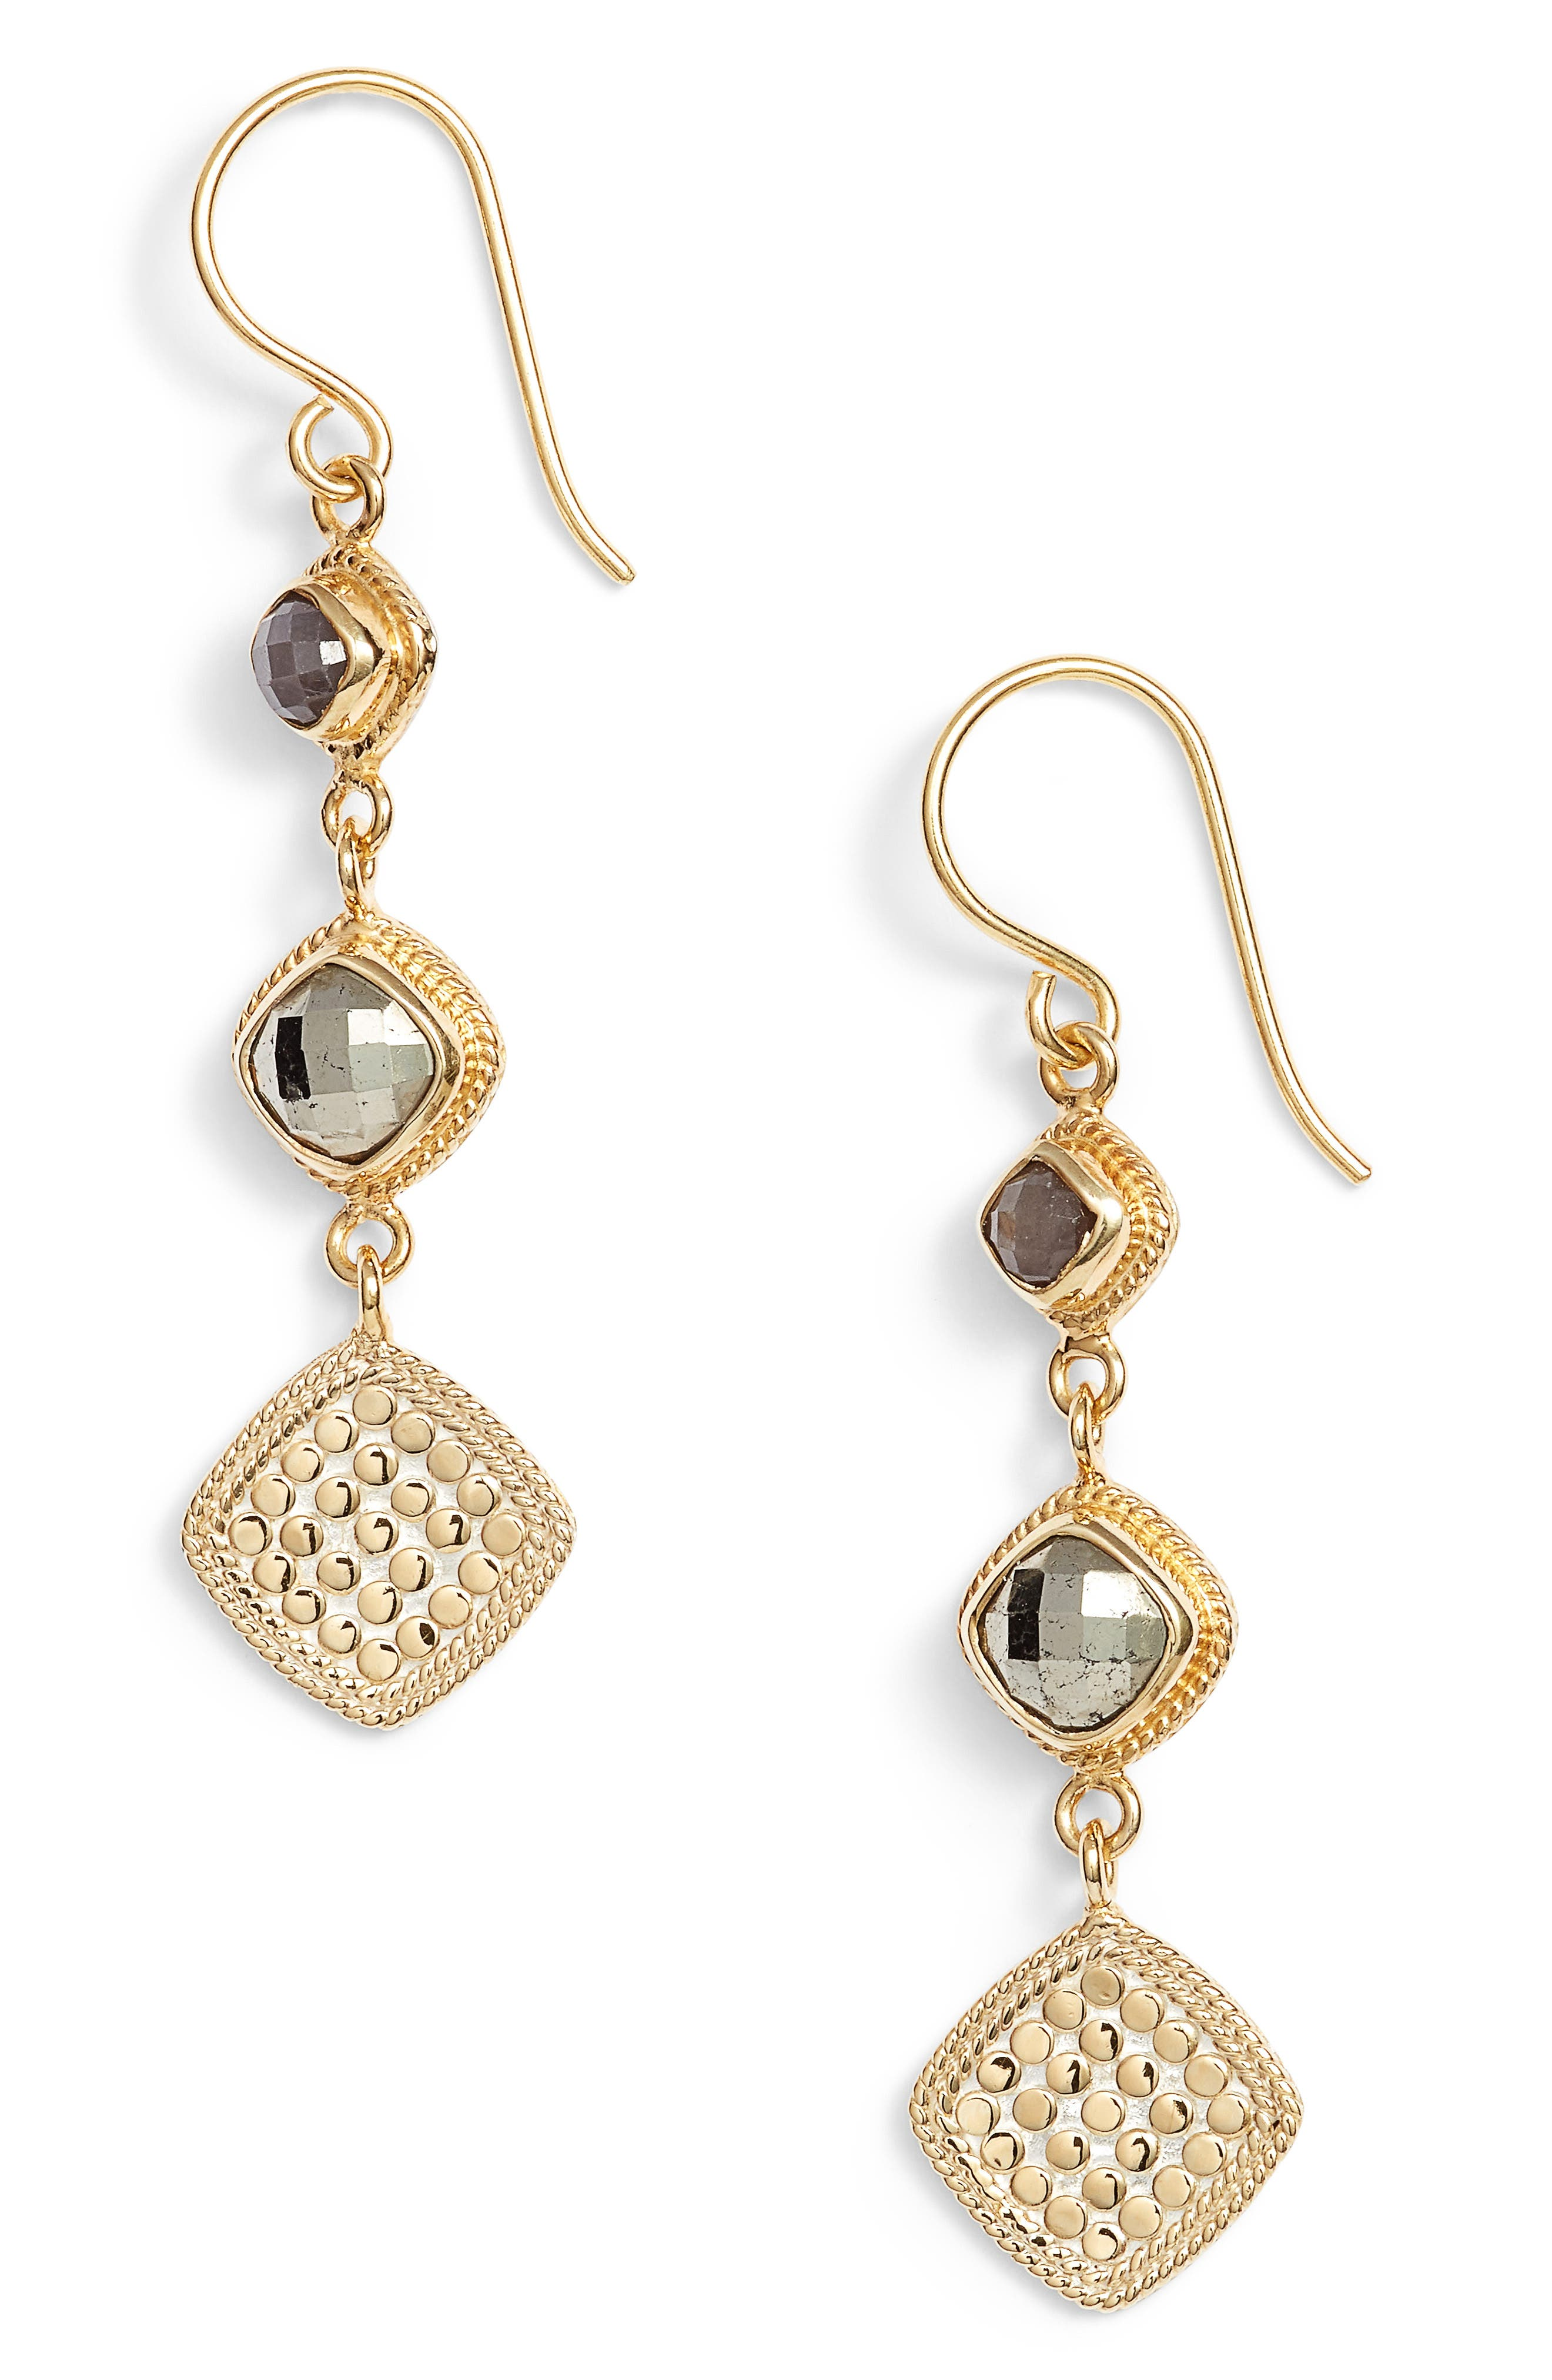 Grey Sapphire & Pyrite Triple Drop Earrings,                         Main,                         color, Gold/ Silver/ Grey/ Pyrite